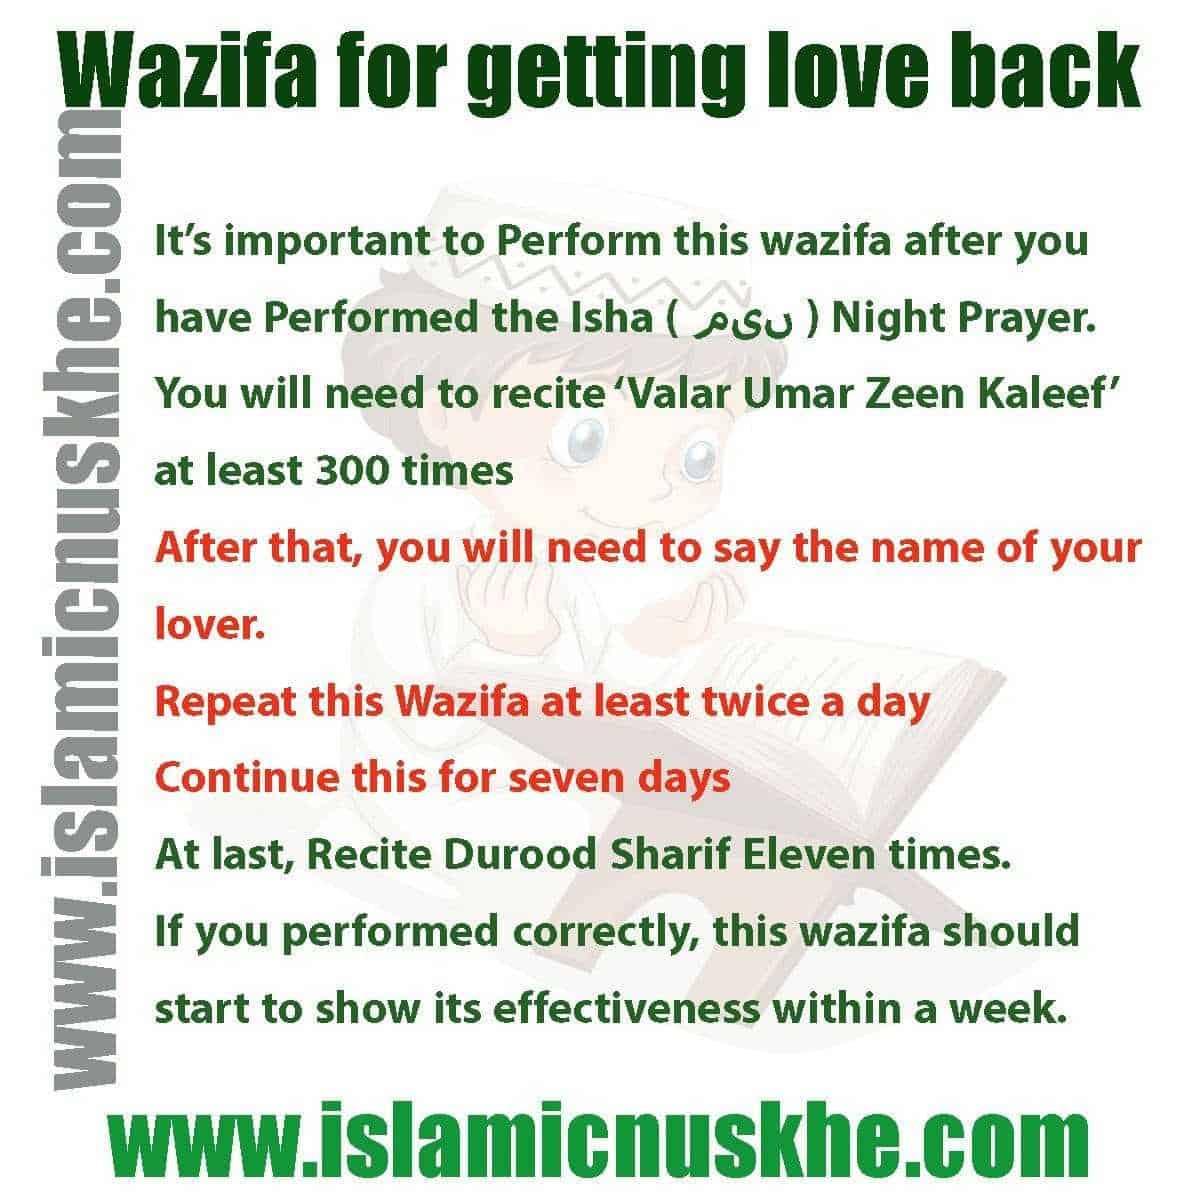 Wazifa for getting love back